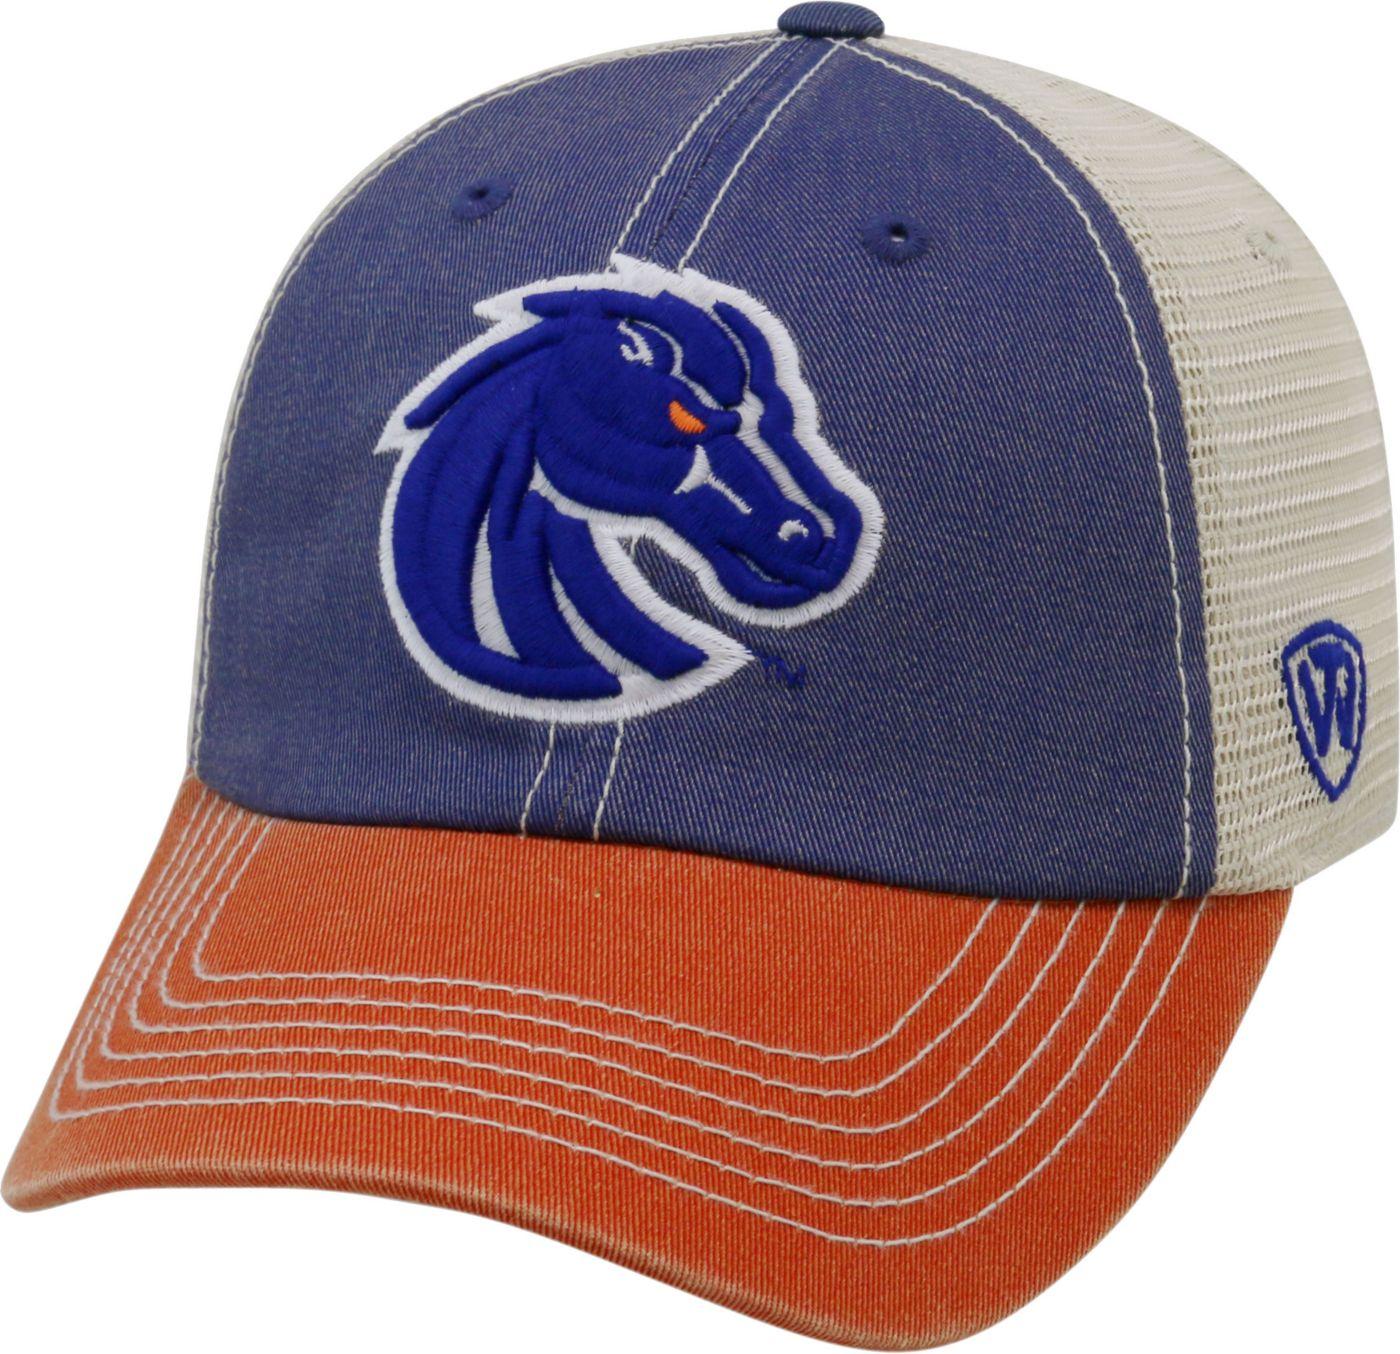 Top of the World Men's Boise State Broncos Blue/White/Orange Off Road Adjustable Hat